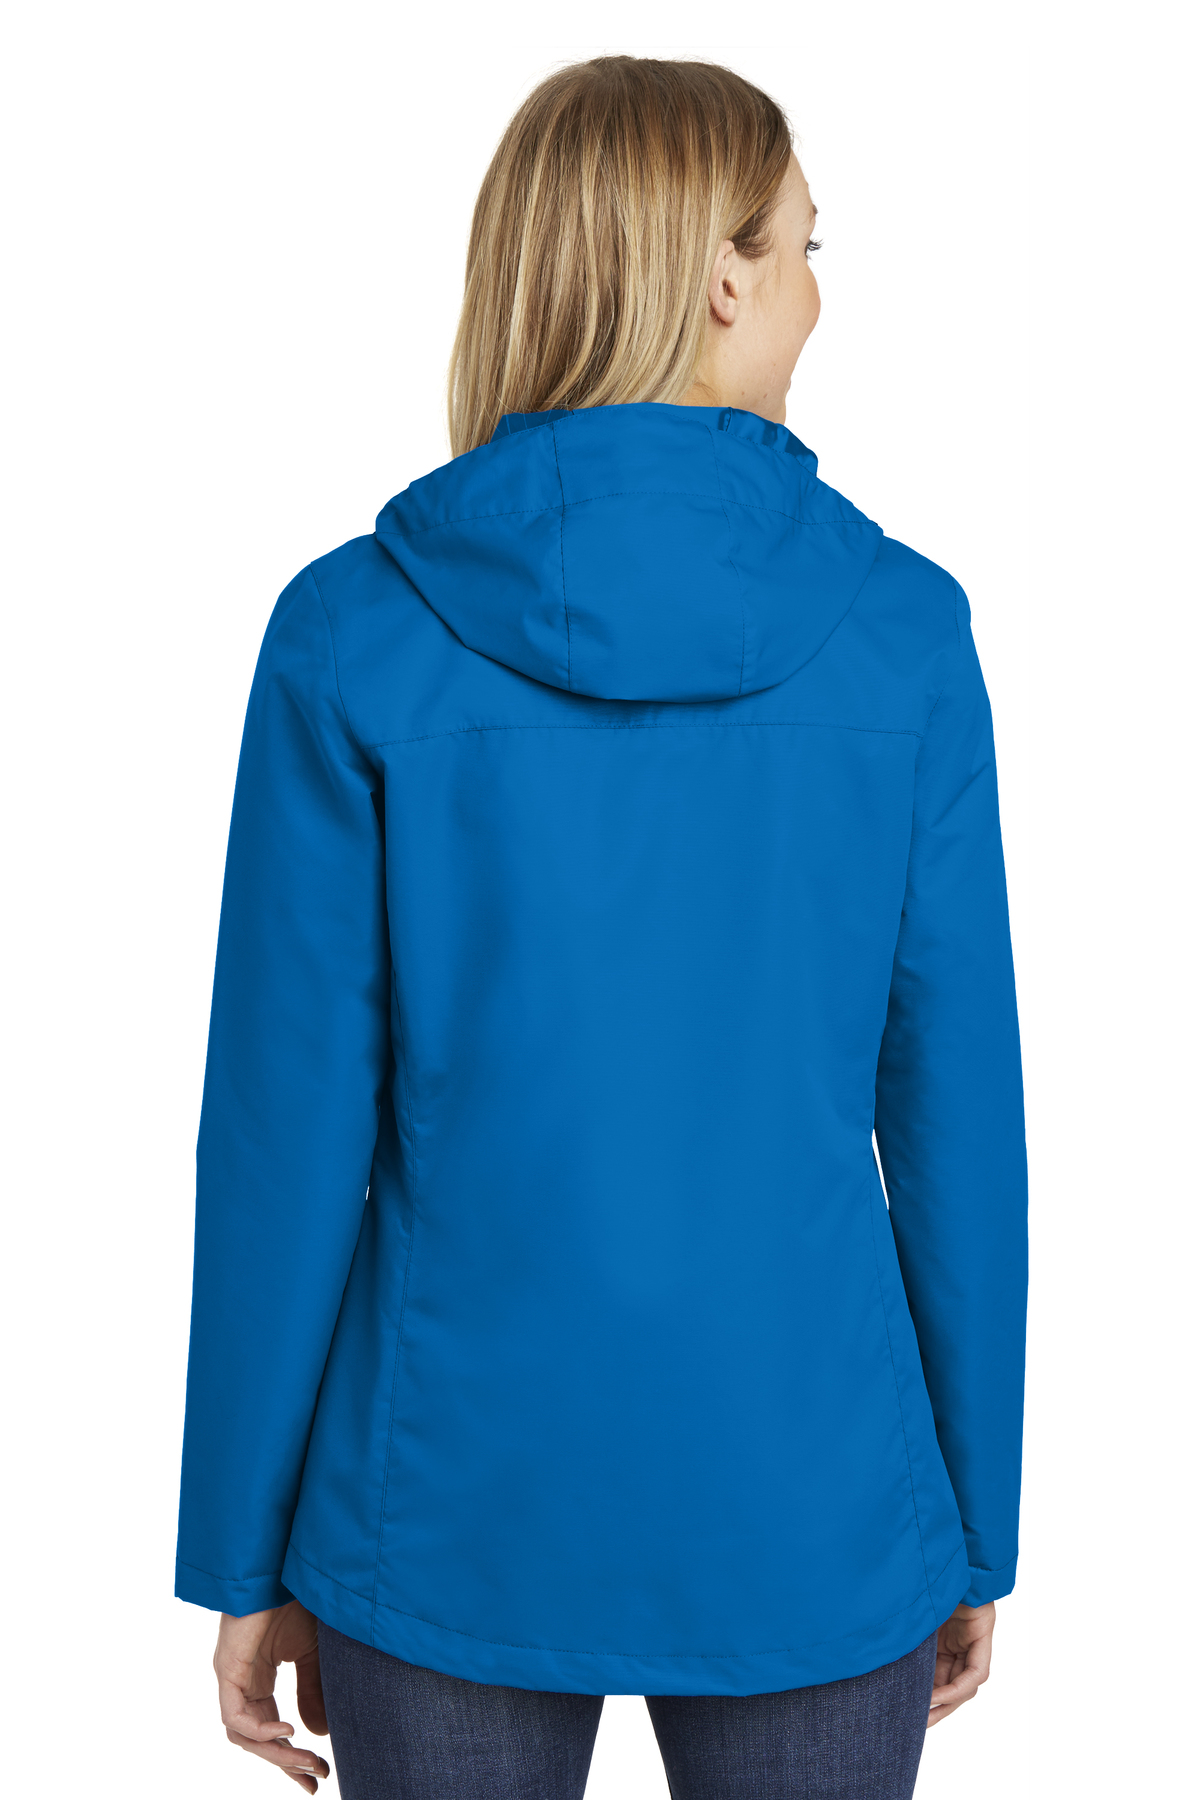 3e0c83e2397 Port Authority® Ladies All-Conditions Jacket